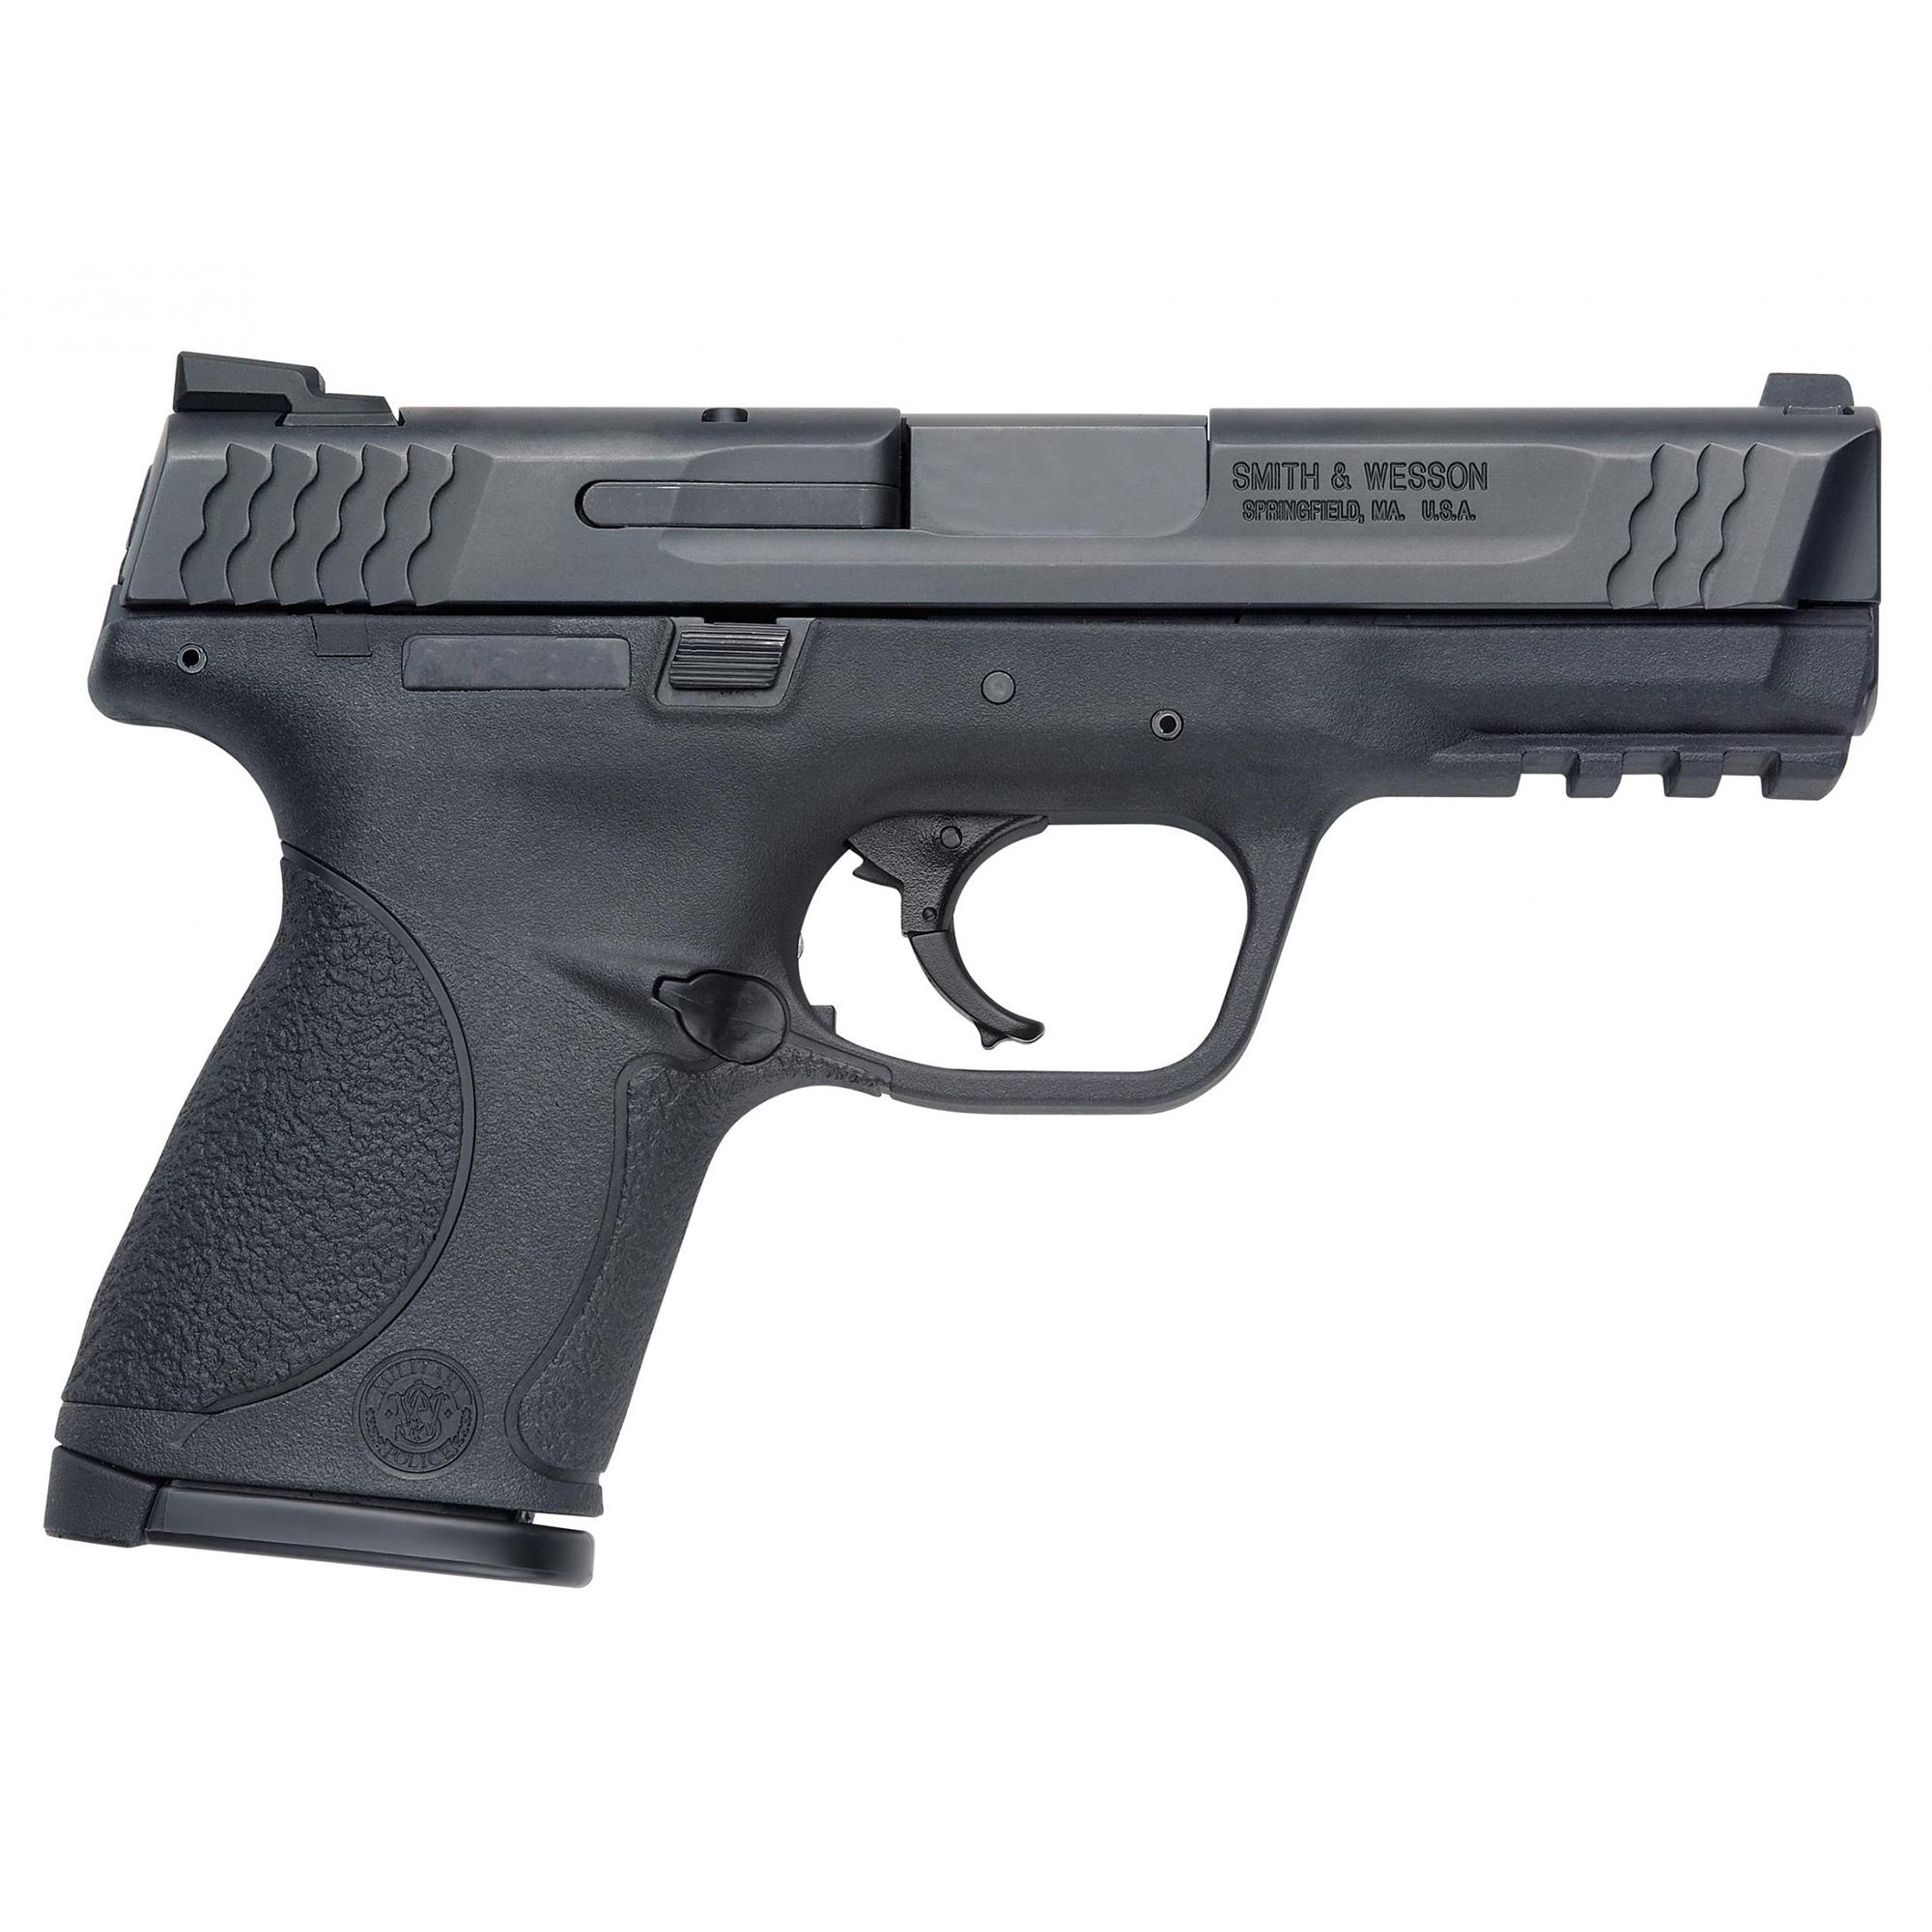 Smith & Wesson M & P45 Compact Handgun